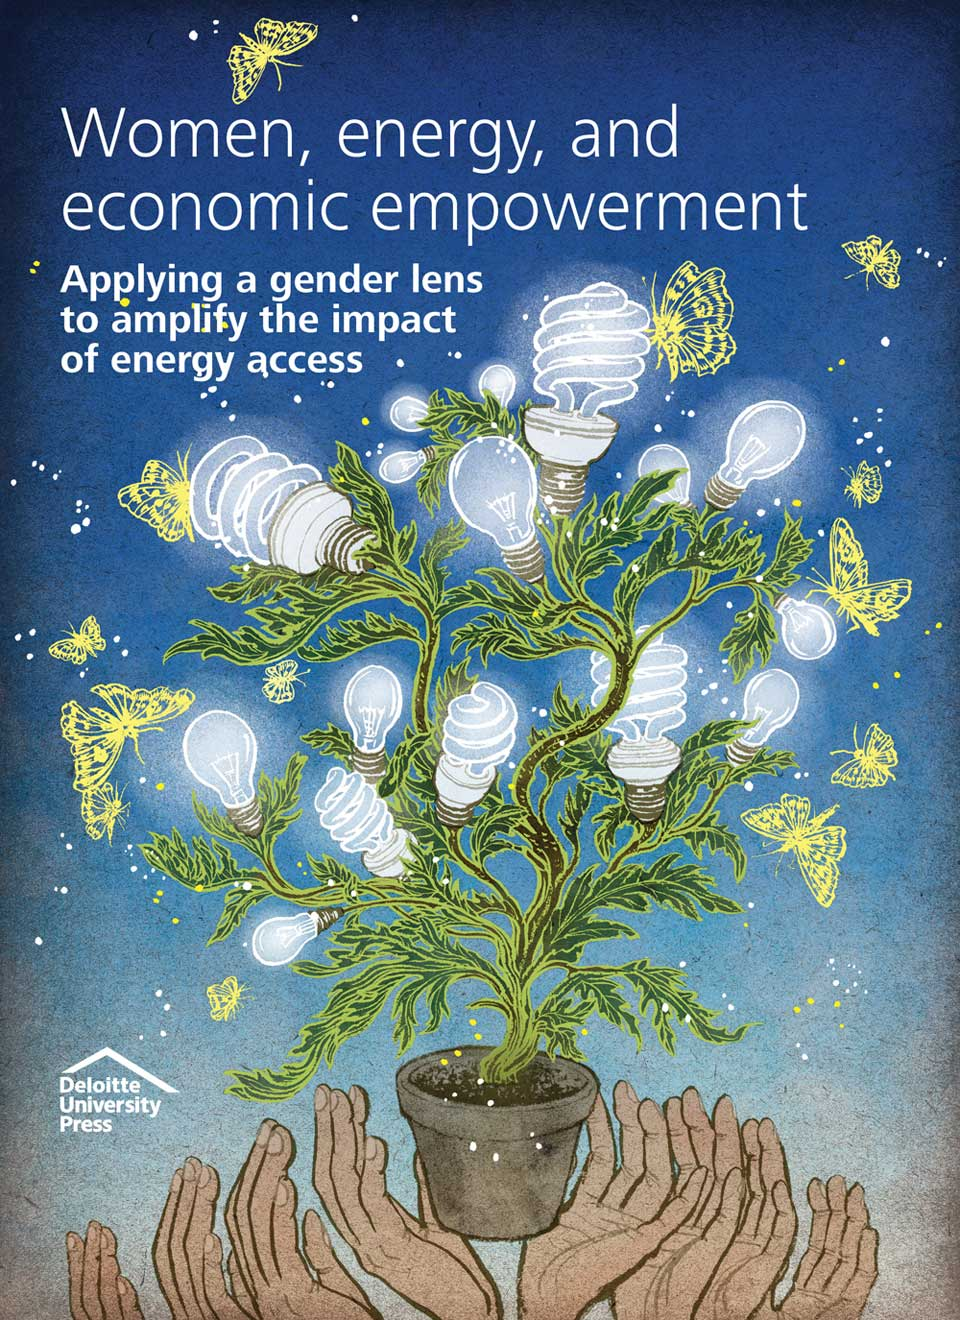 Yuko Shimizu - Deloitte Women, energy and economic empowerment -